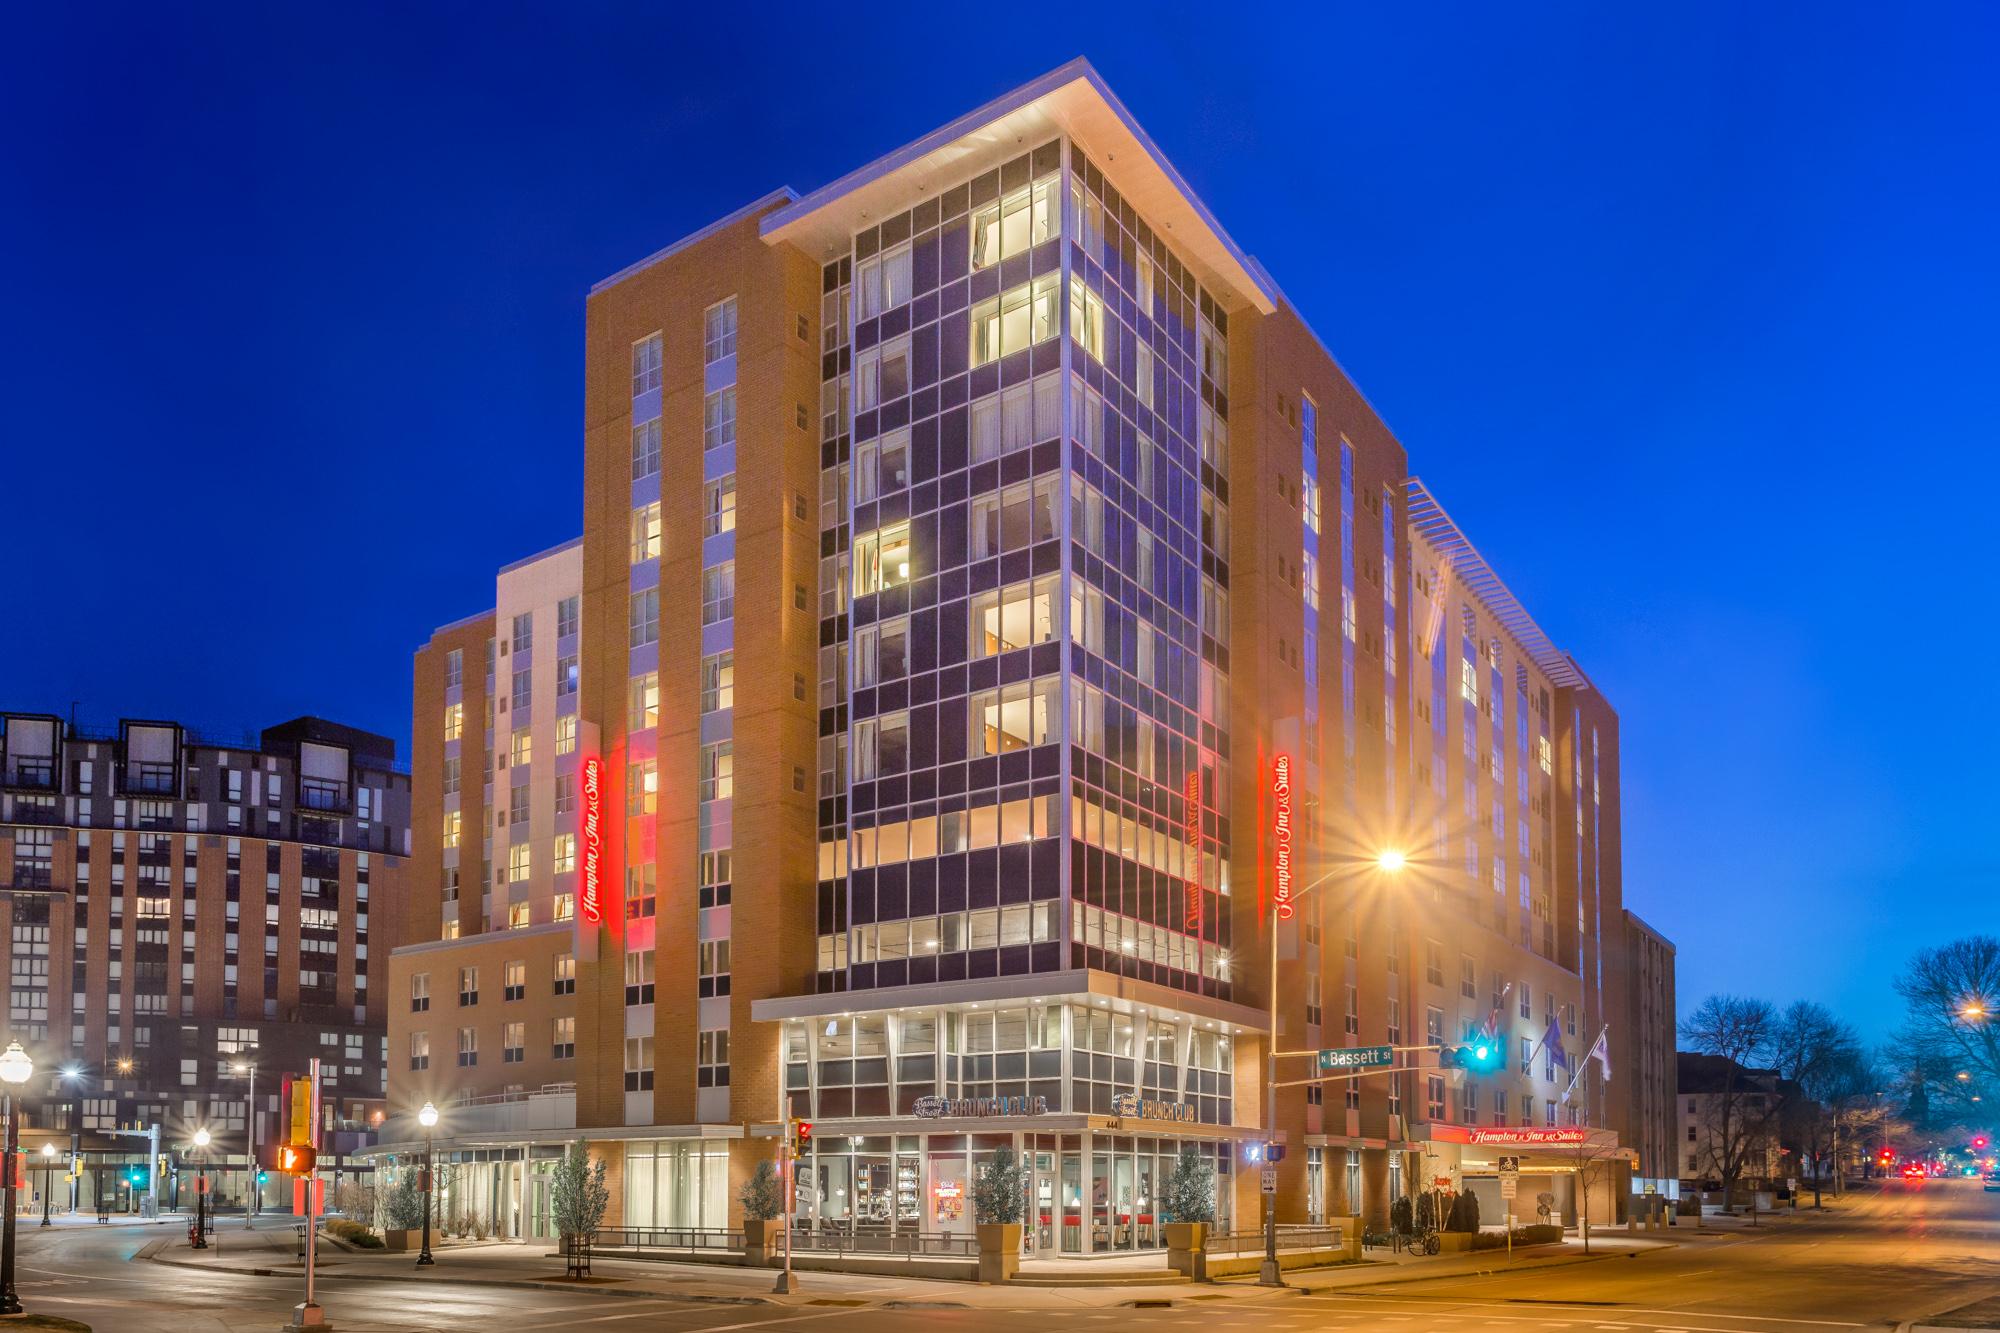 https://www.hotelsbyday.com/_data/default-hotel_image/2/13099/hampton-inn-msnbjhx-downtown-madison-wi-exterior-blue-9515-low-res.jpg